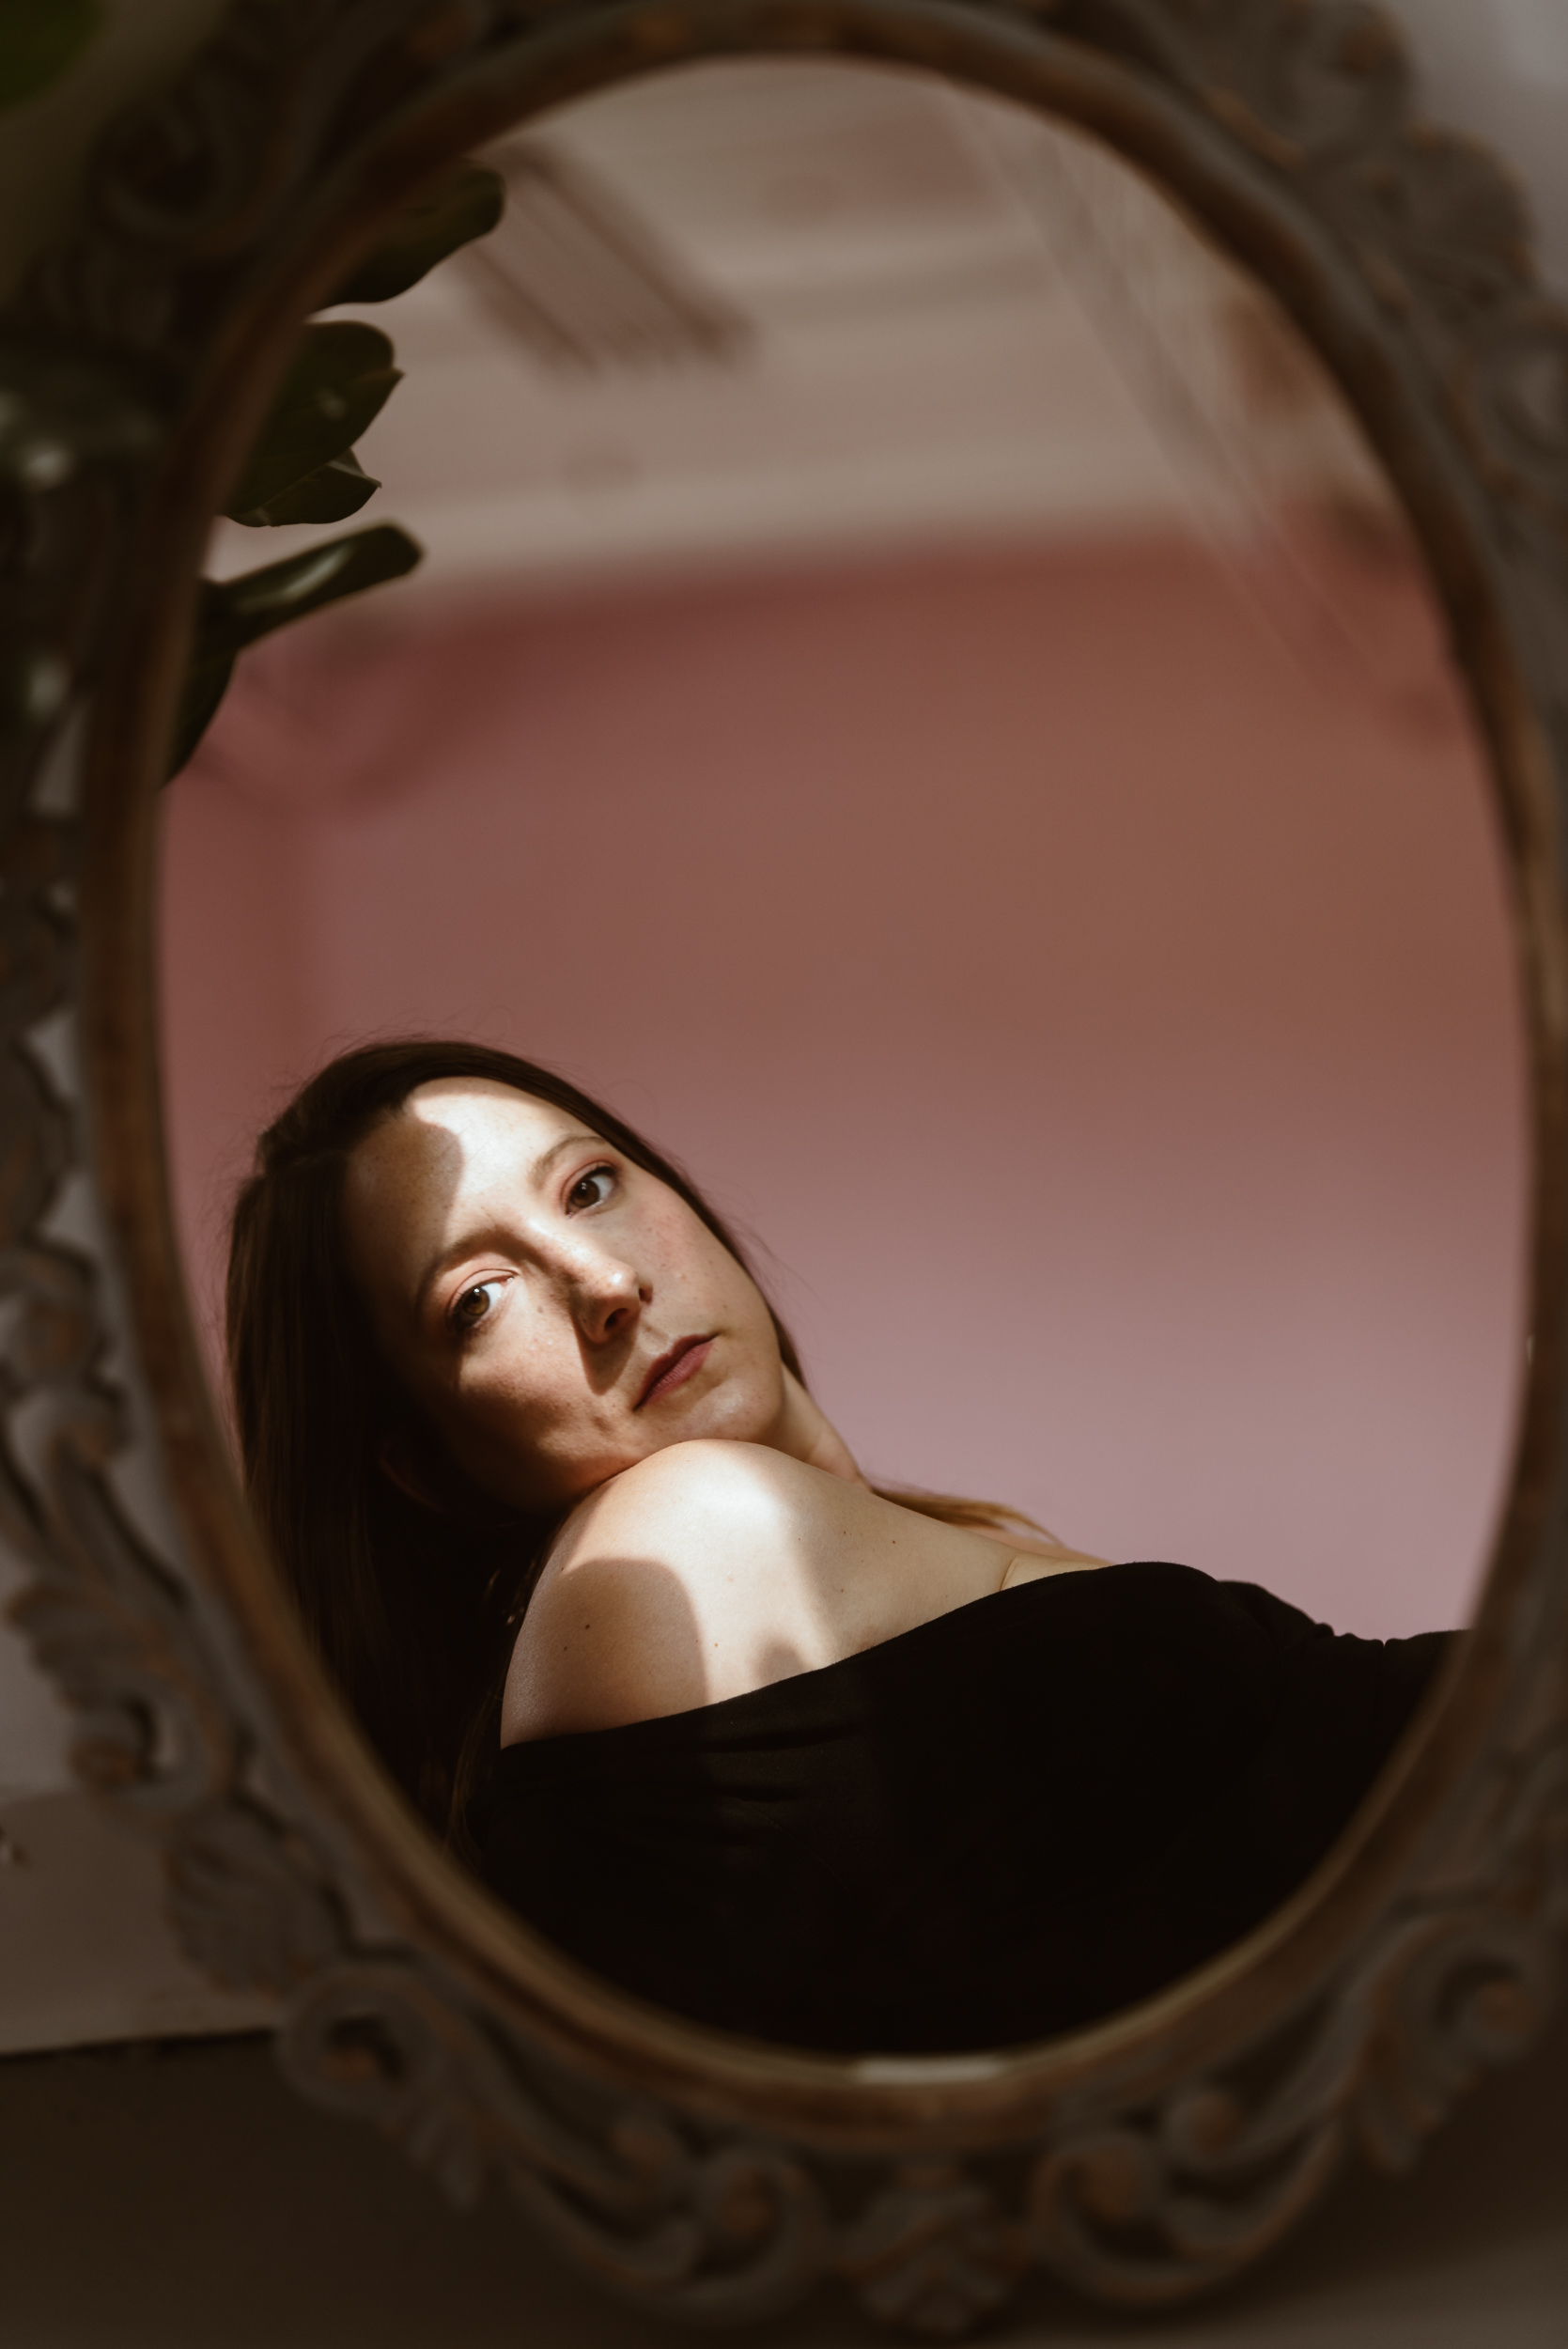 20190907-AmandaLewis-PortraitsCassRudolph-SocialMediaSize-13.jpg